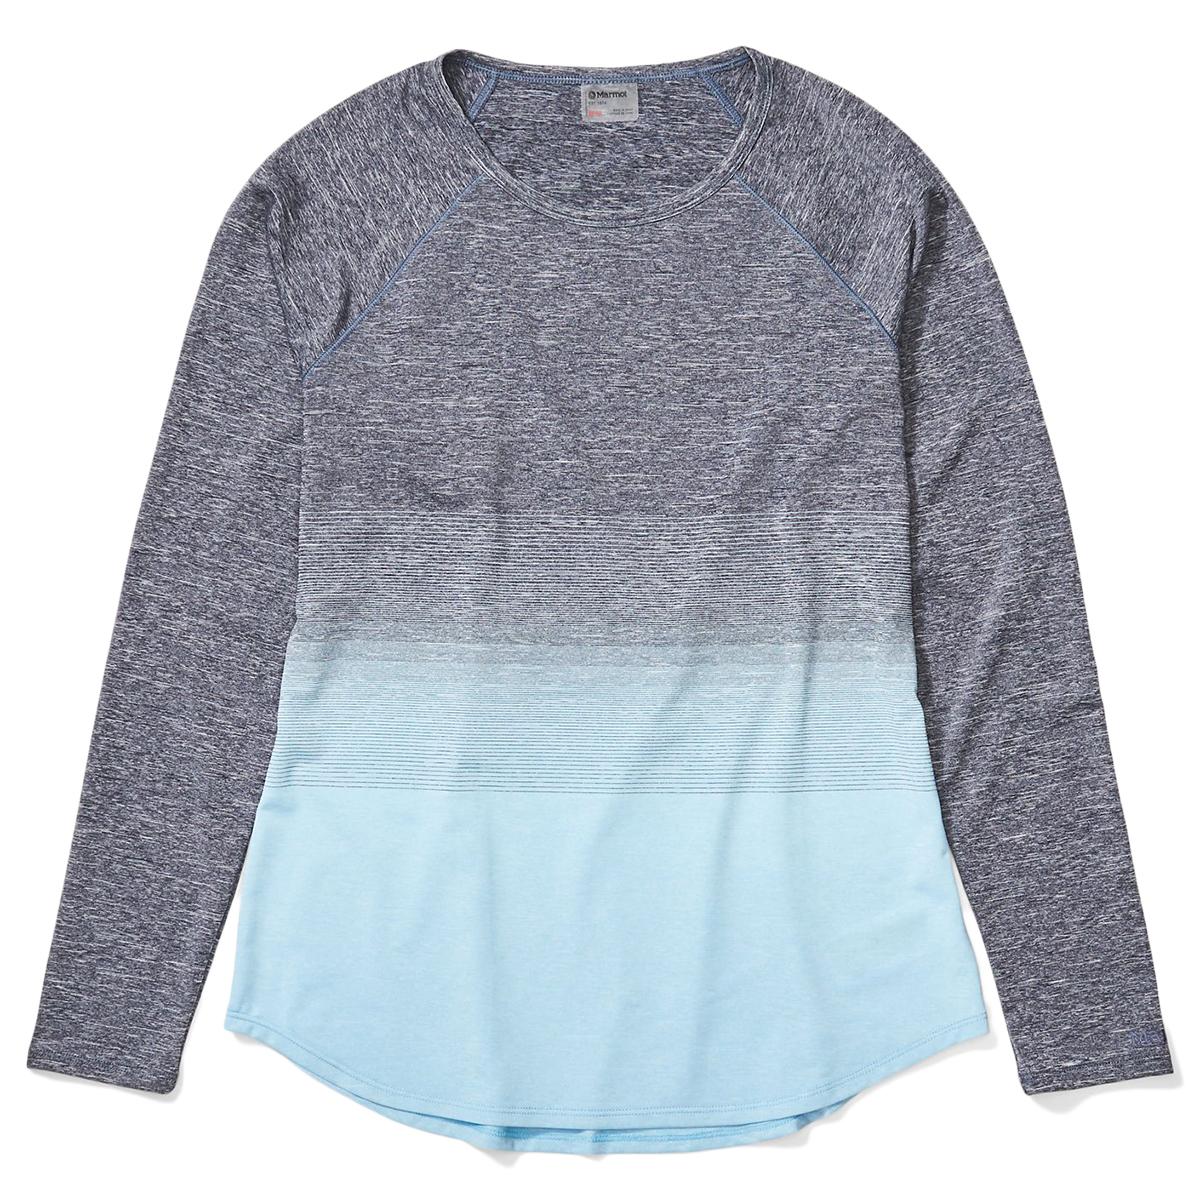 Marmot Women's Cabrillo Long-Sleeve Shirt - Blue, M